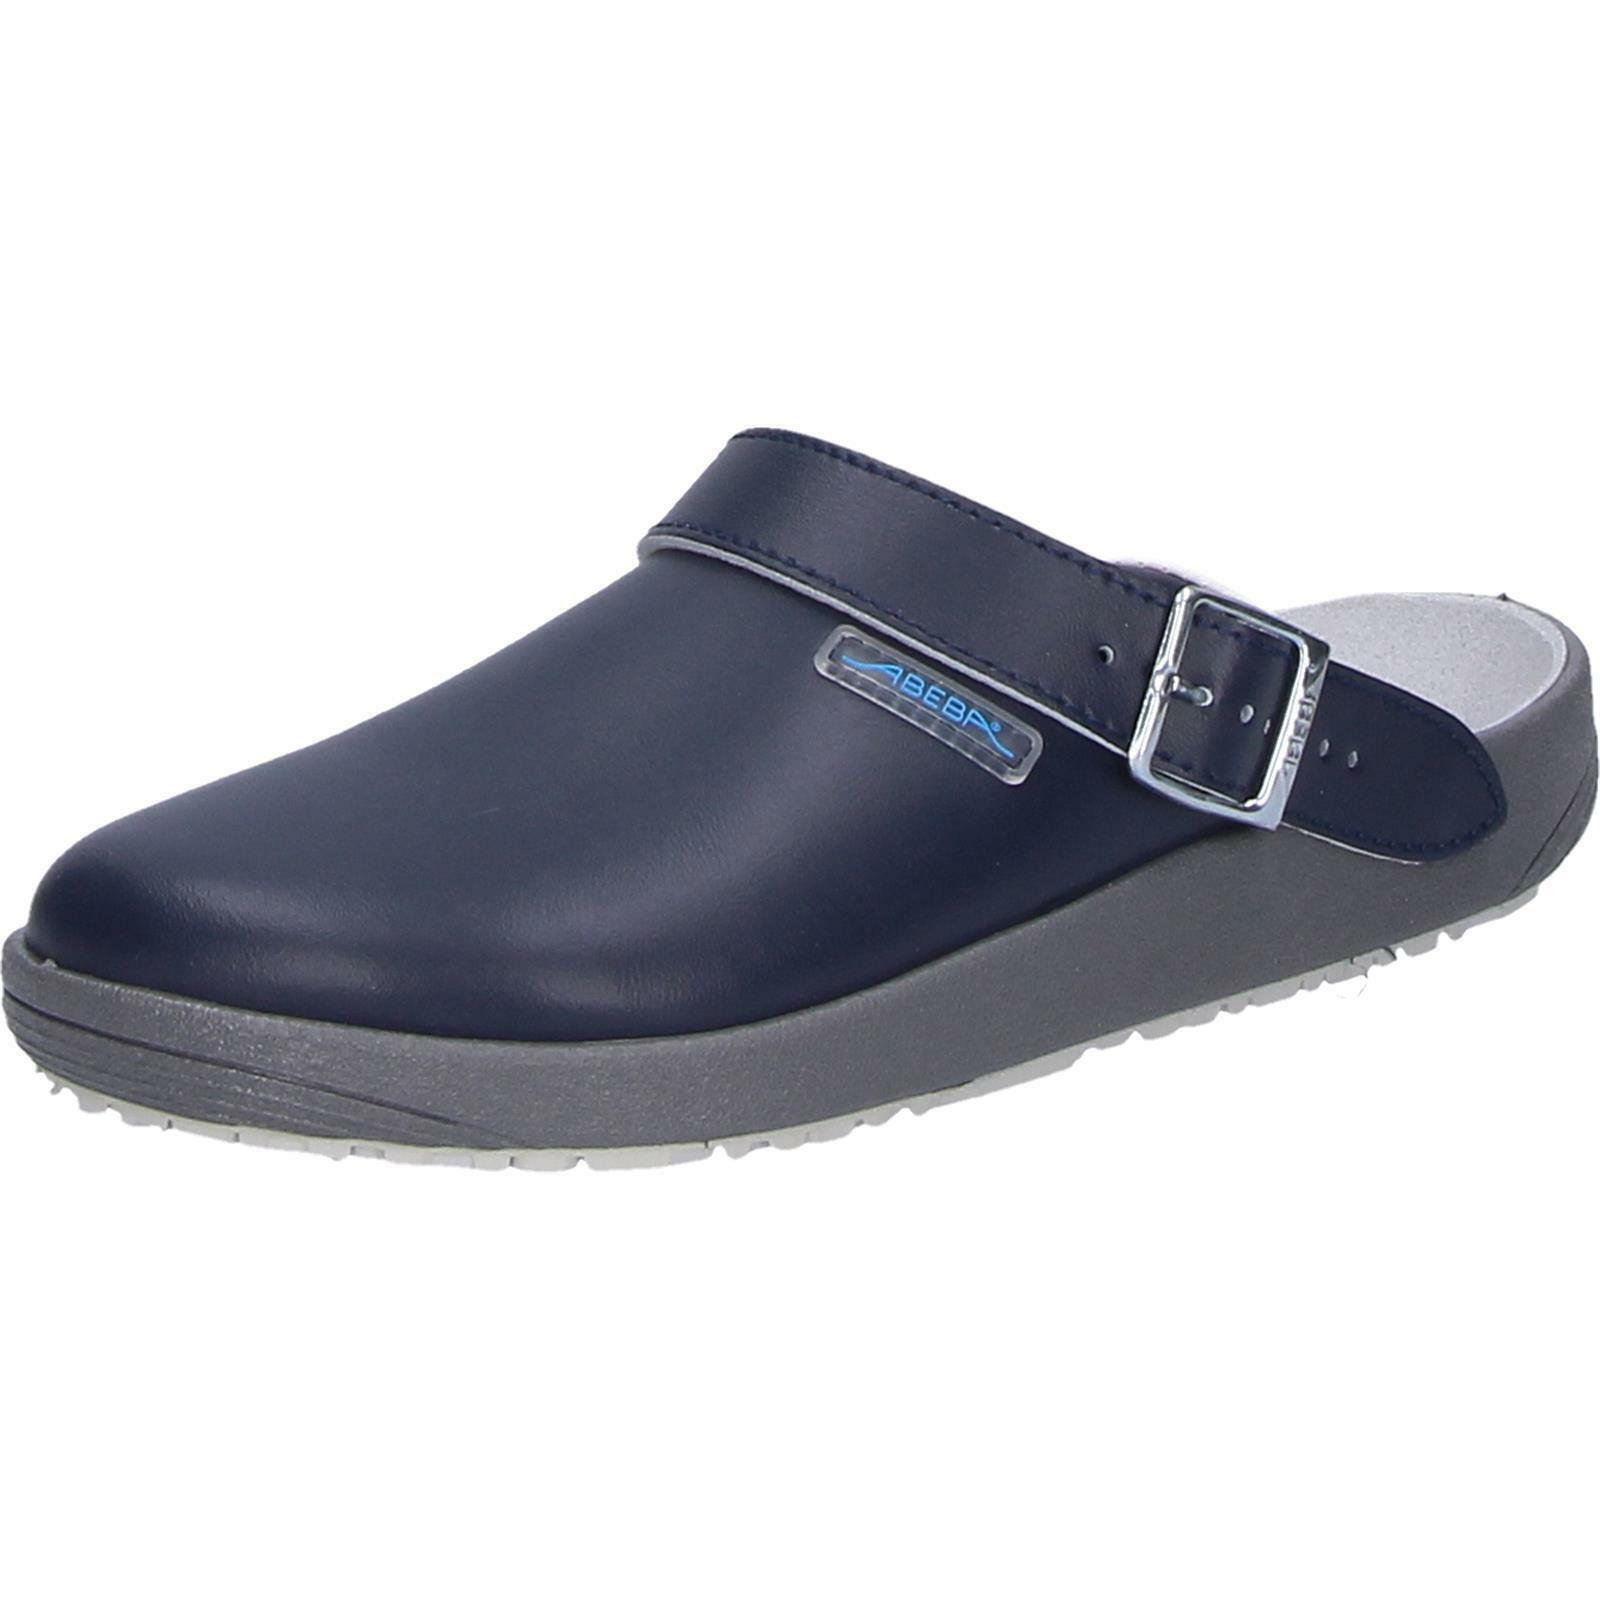 Abeba profesión zapatos zapatos de trabajo zapatos zapatillas Color marine talla 36